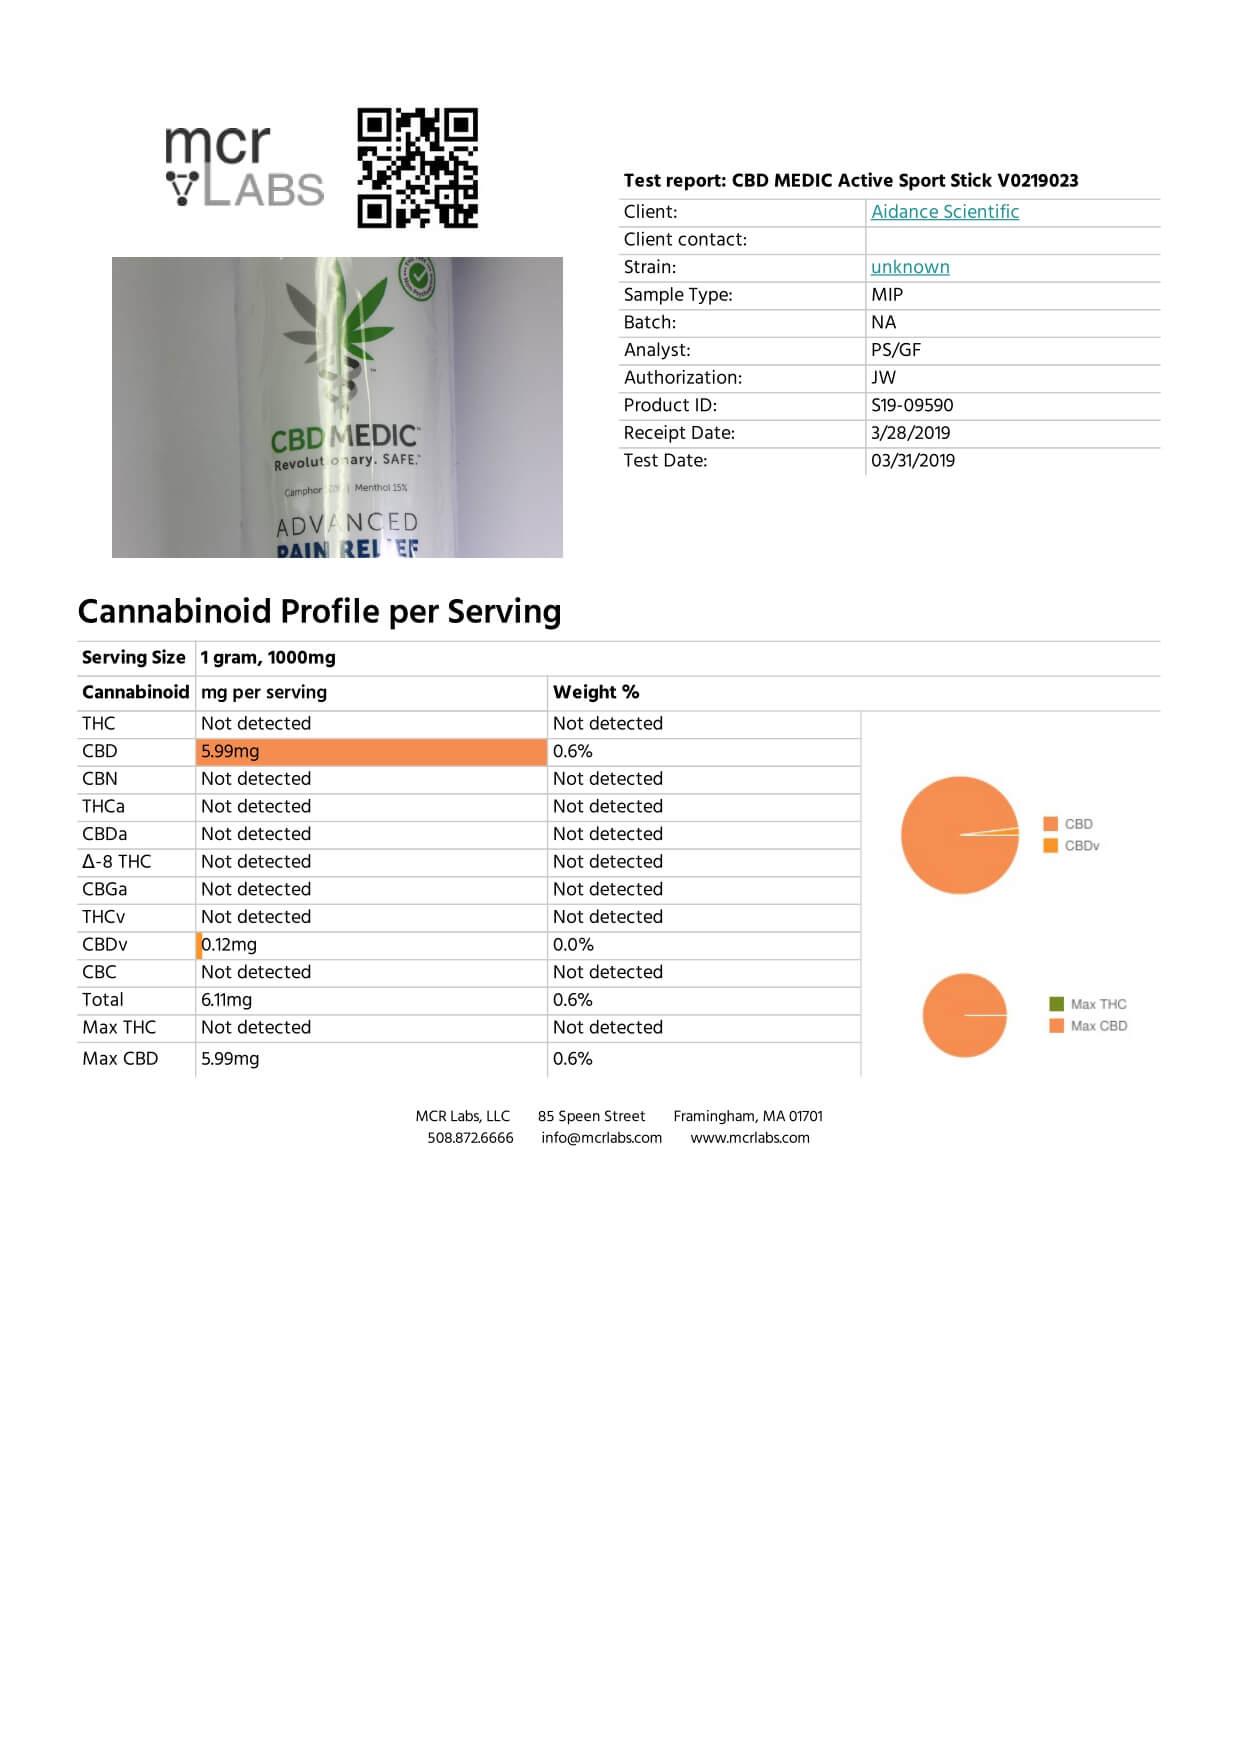 CBDMEDIC CBD Topical Active Sport Pain Relief Stick Lab Report